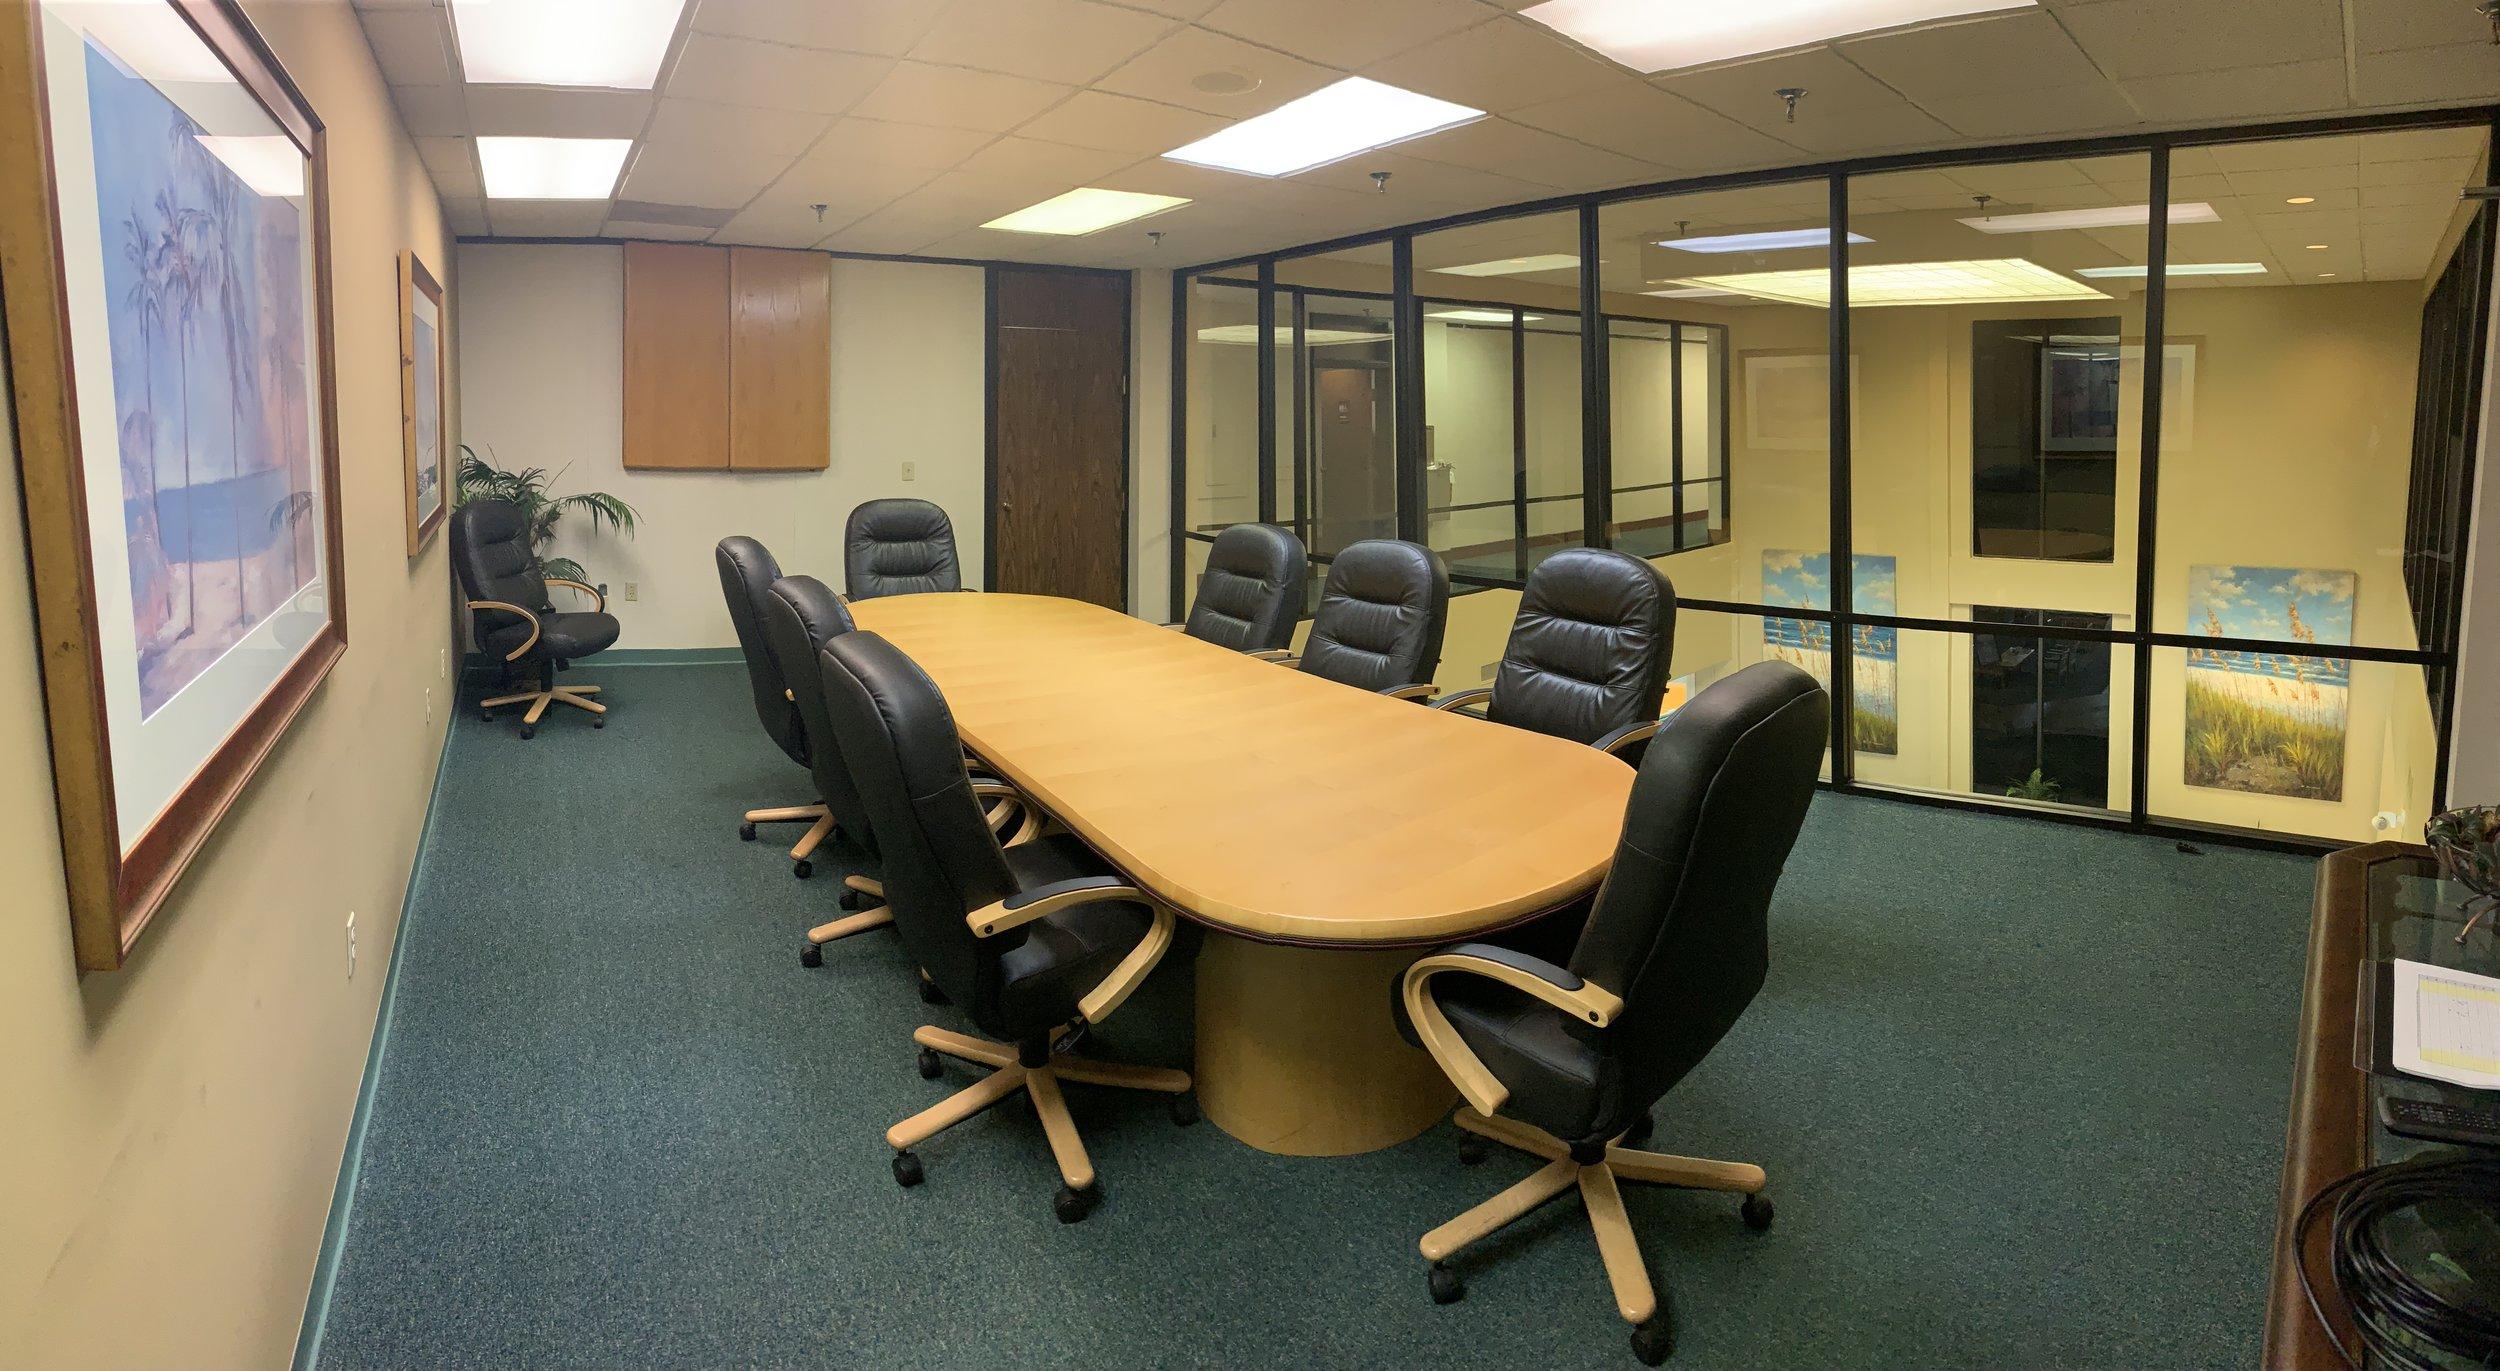 Panama City Beach - Main Conference Room